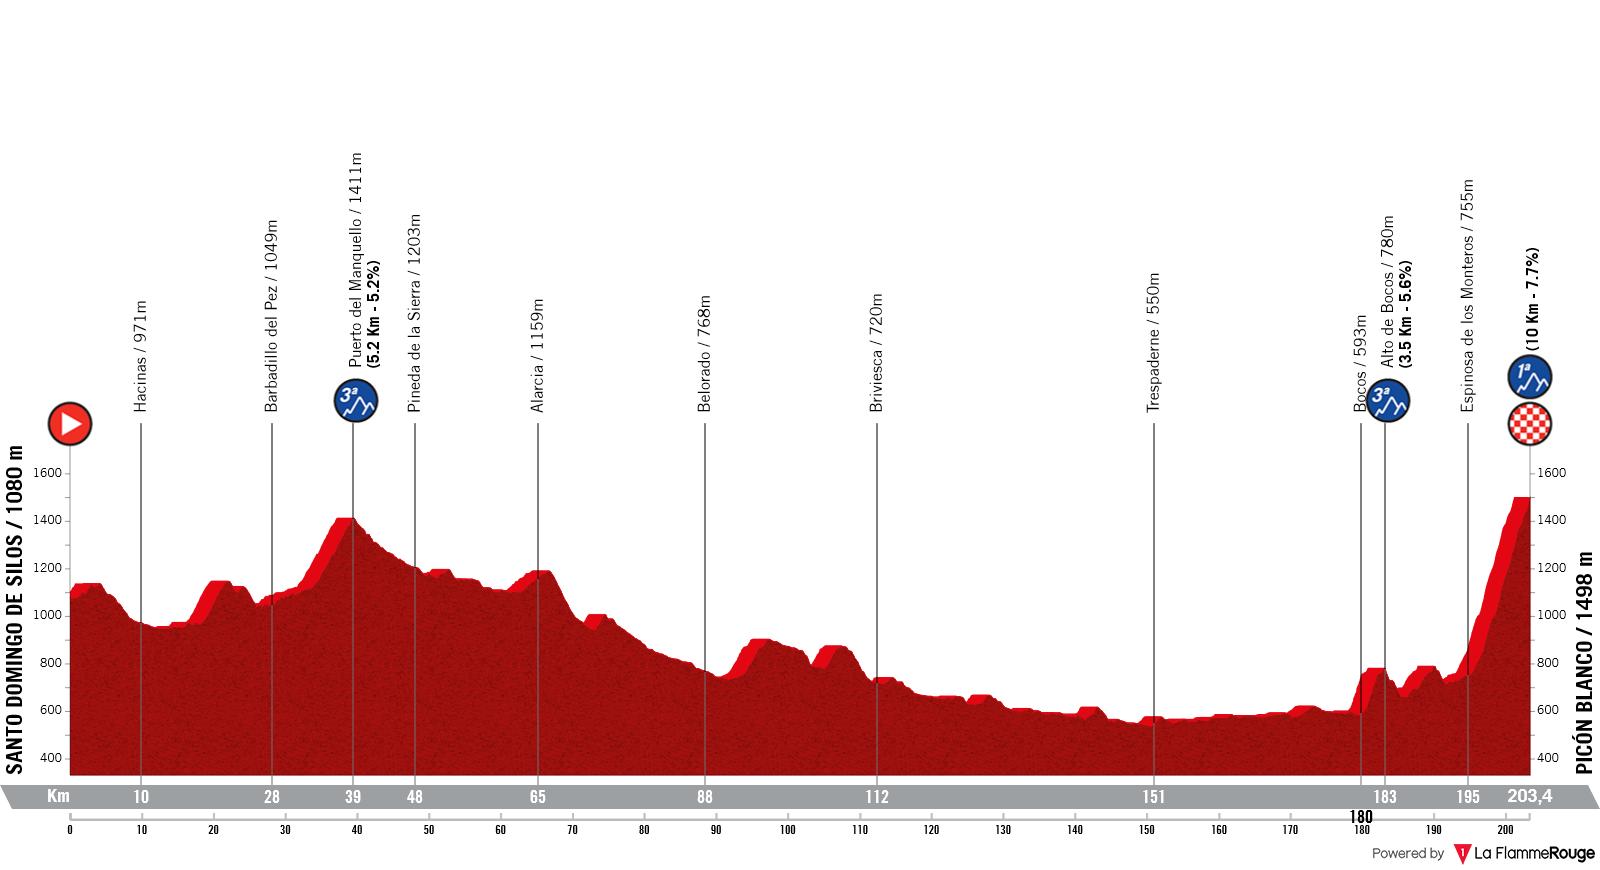 Etapa 3 - Vuelta España 2021 - Santo Domingo de Silos Espinosa de los Monteros. Picón Blanco